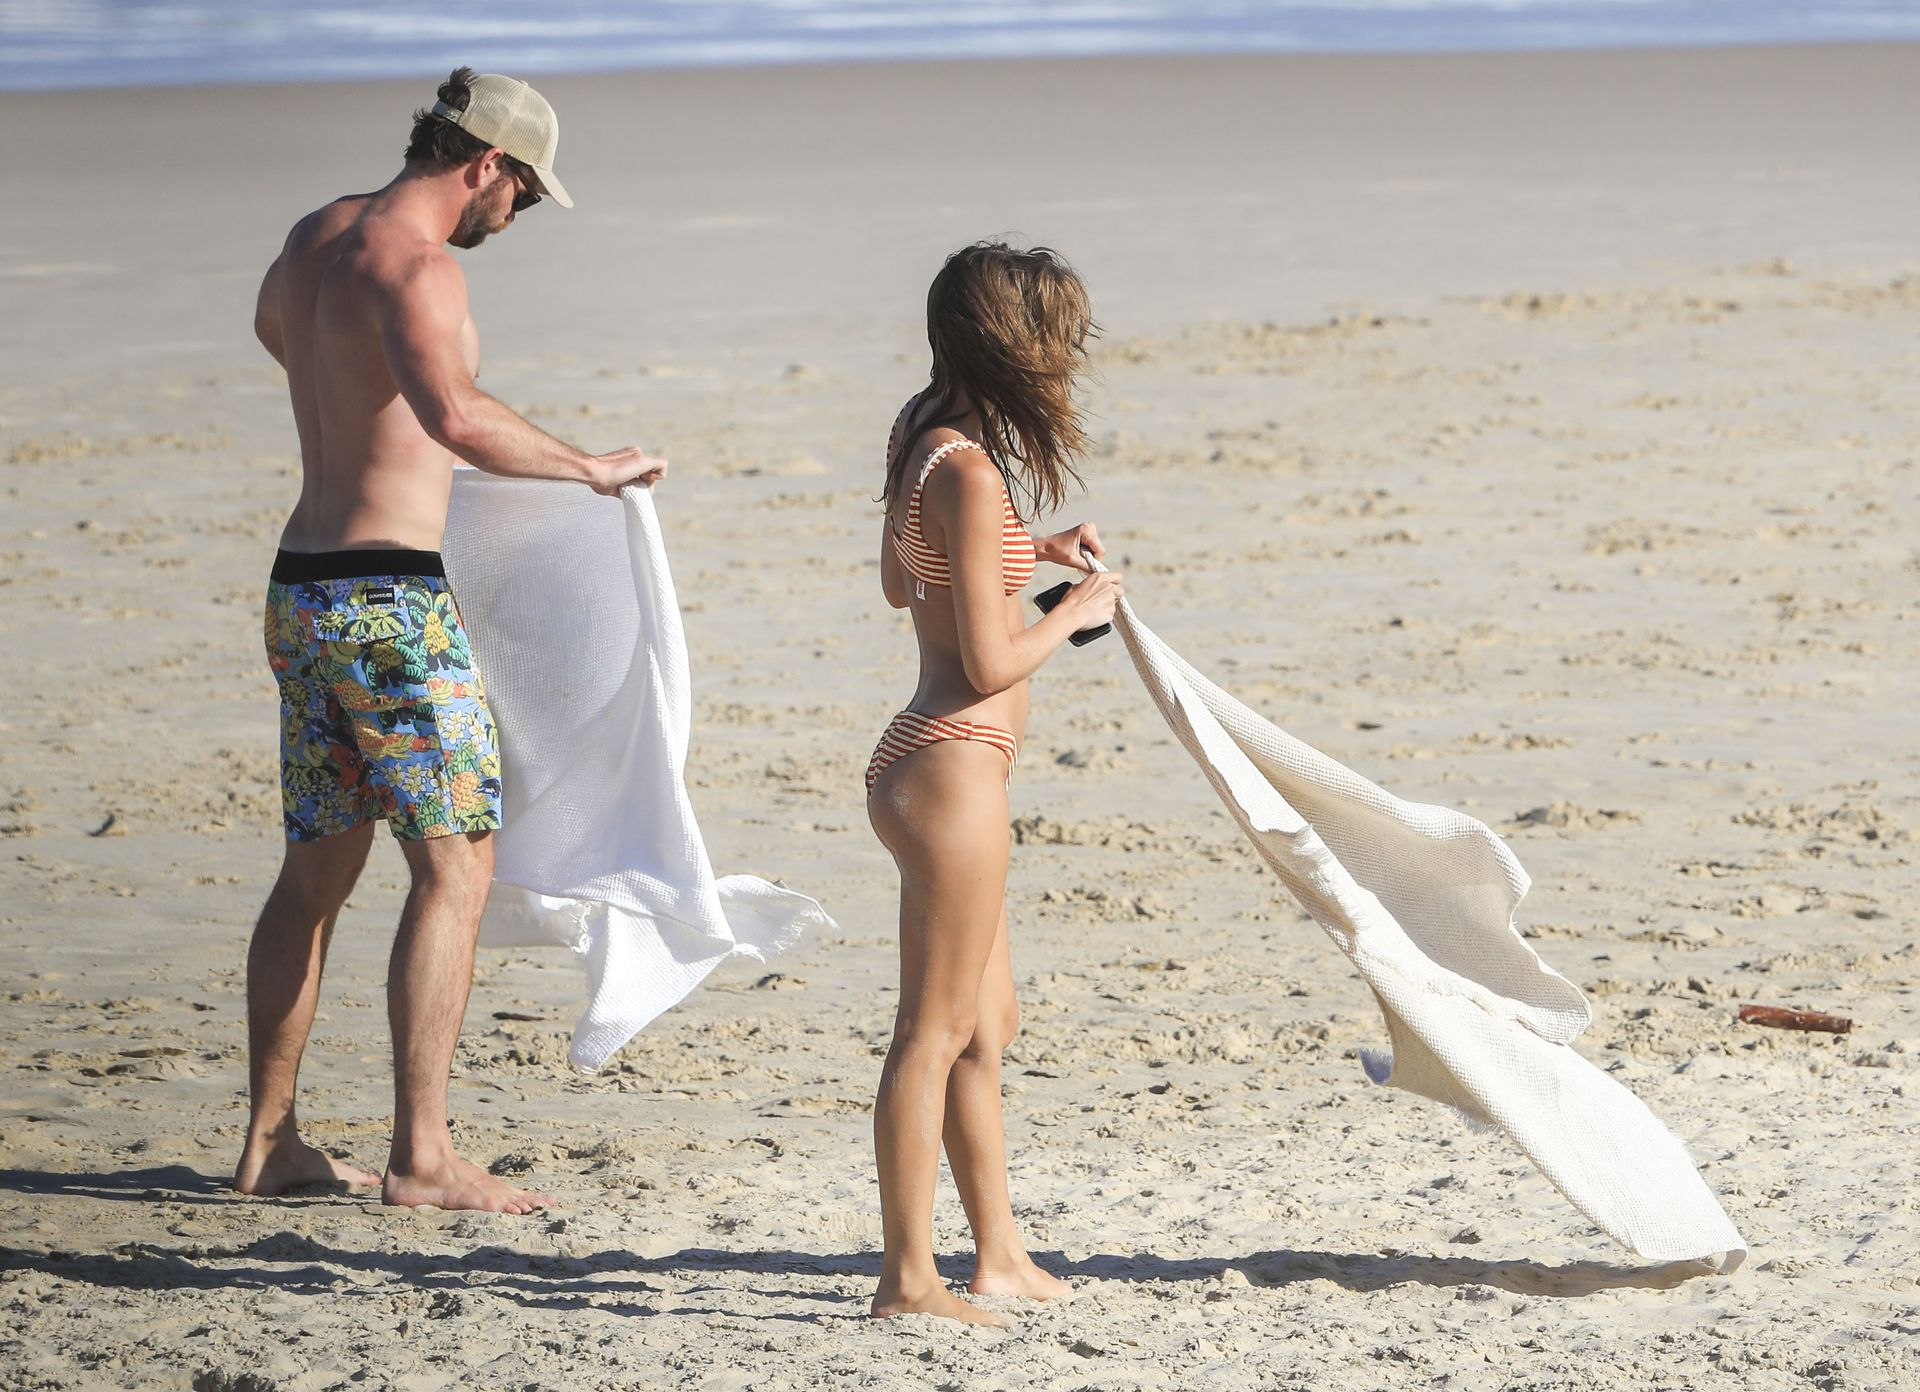 Gabriella Brooks Hot – Liam Hemsworth's New Girlfriend 0056